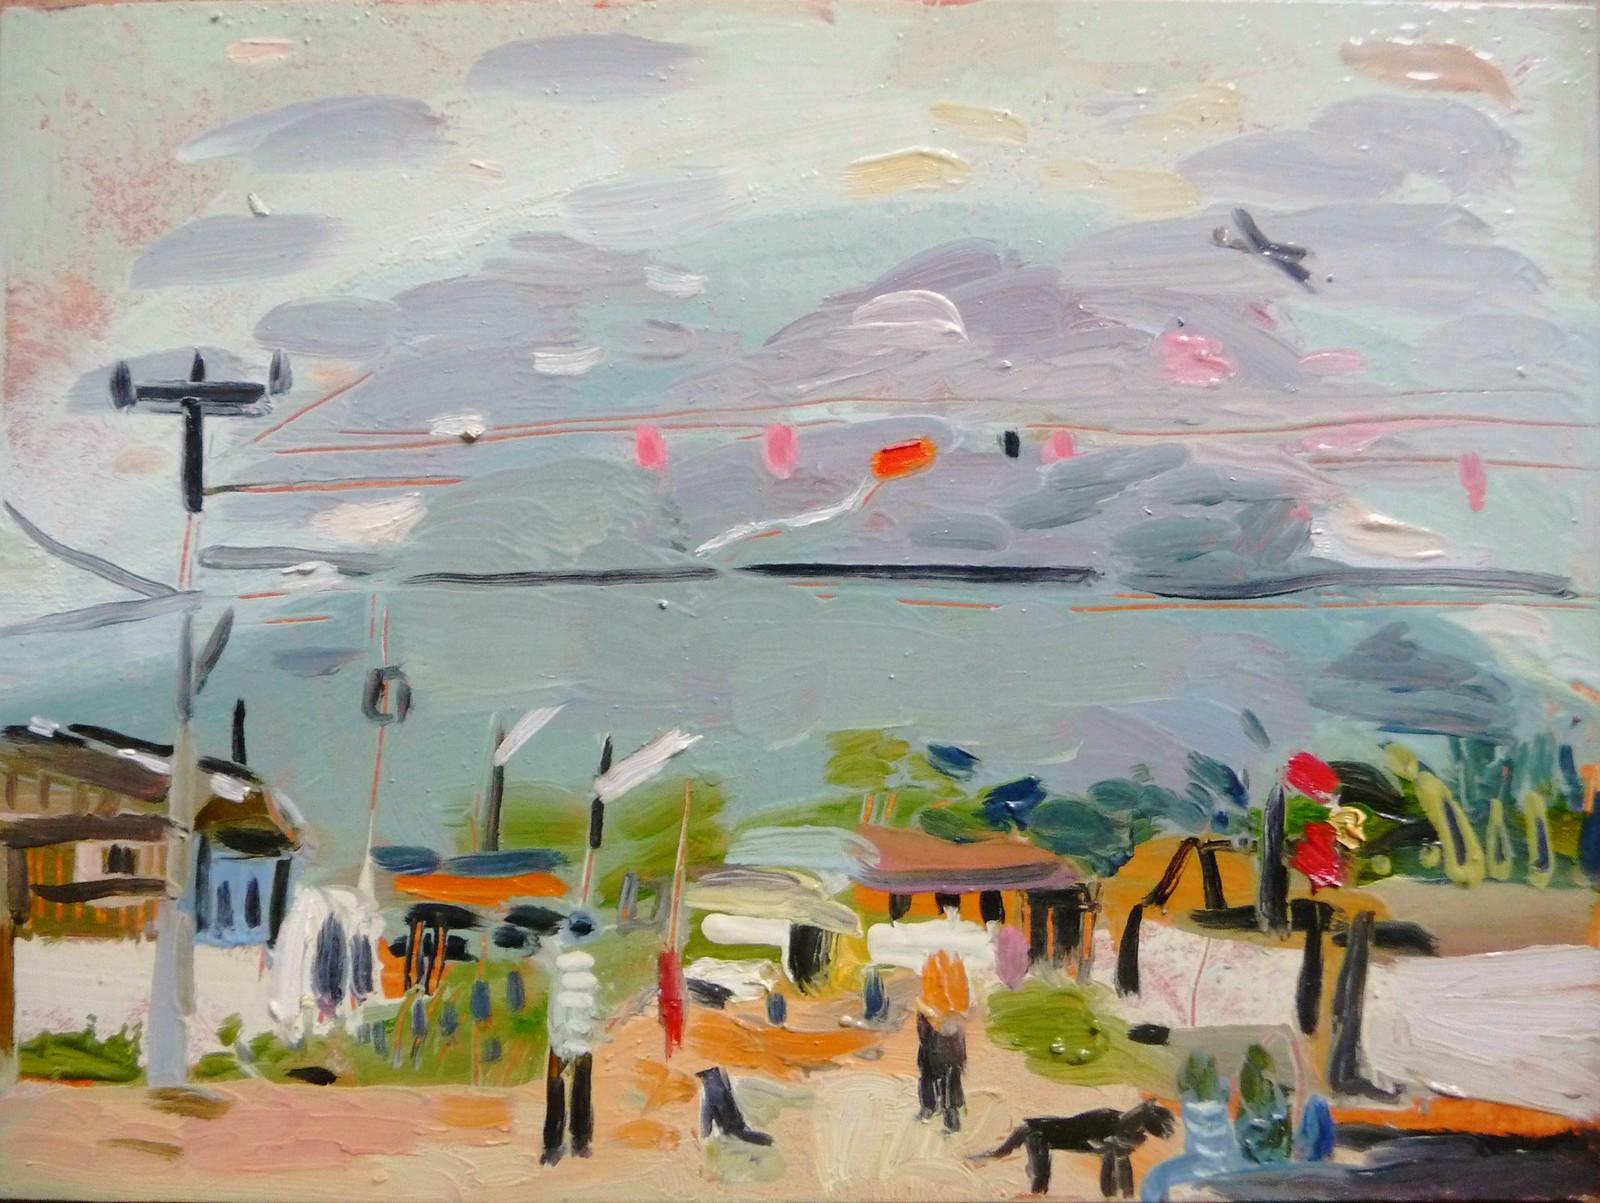 May Day, Pedra Branca: children, dogs, kites   by tadeusz deręgowski